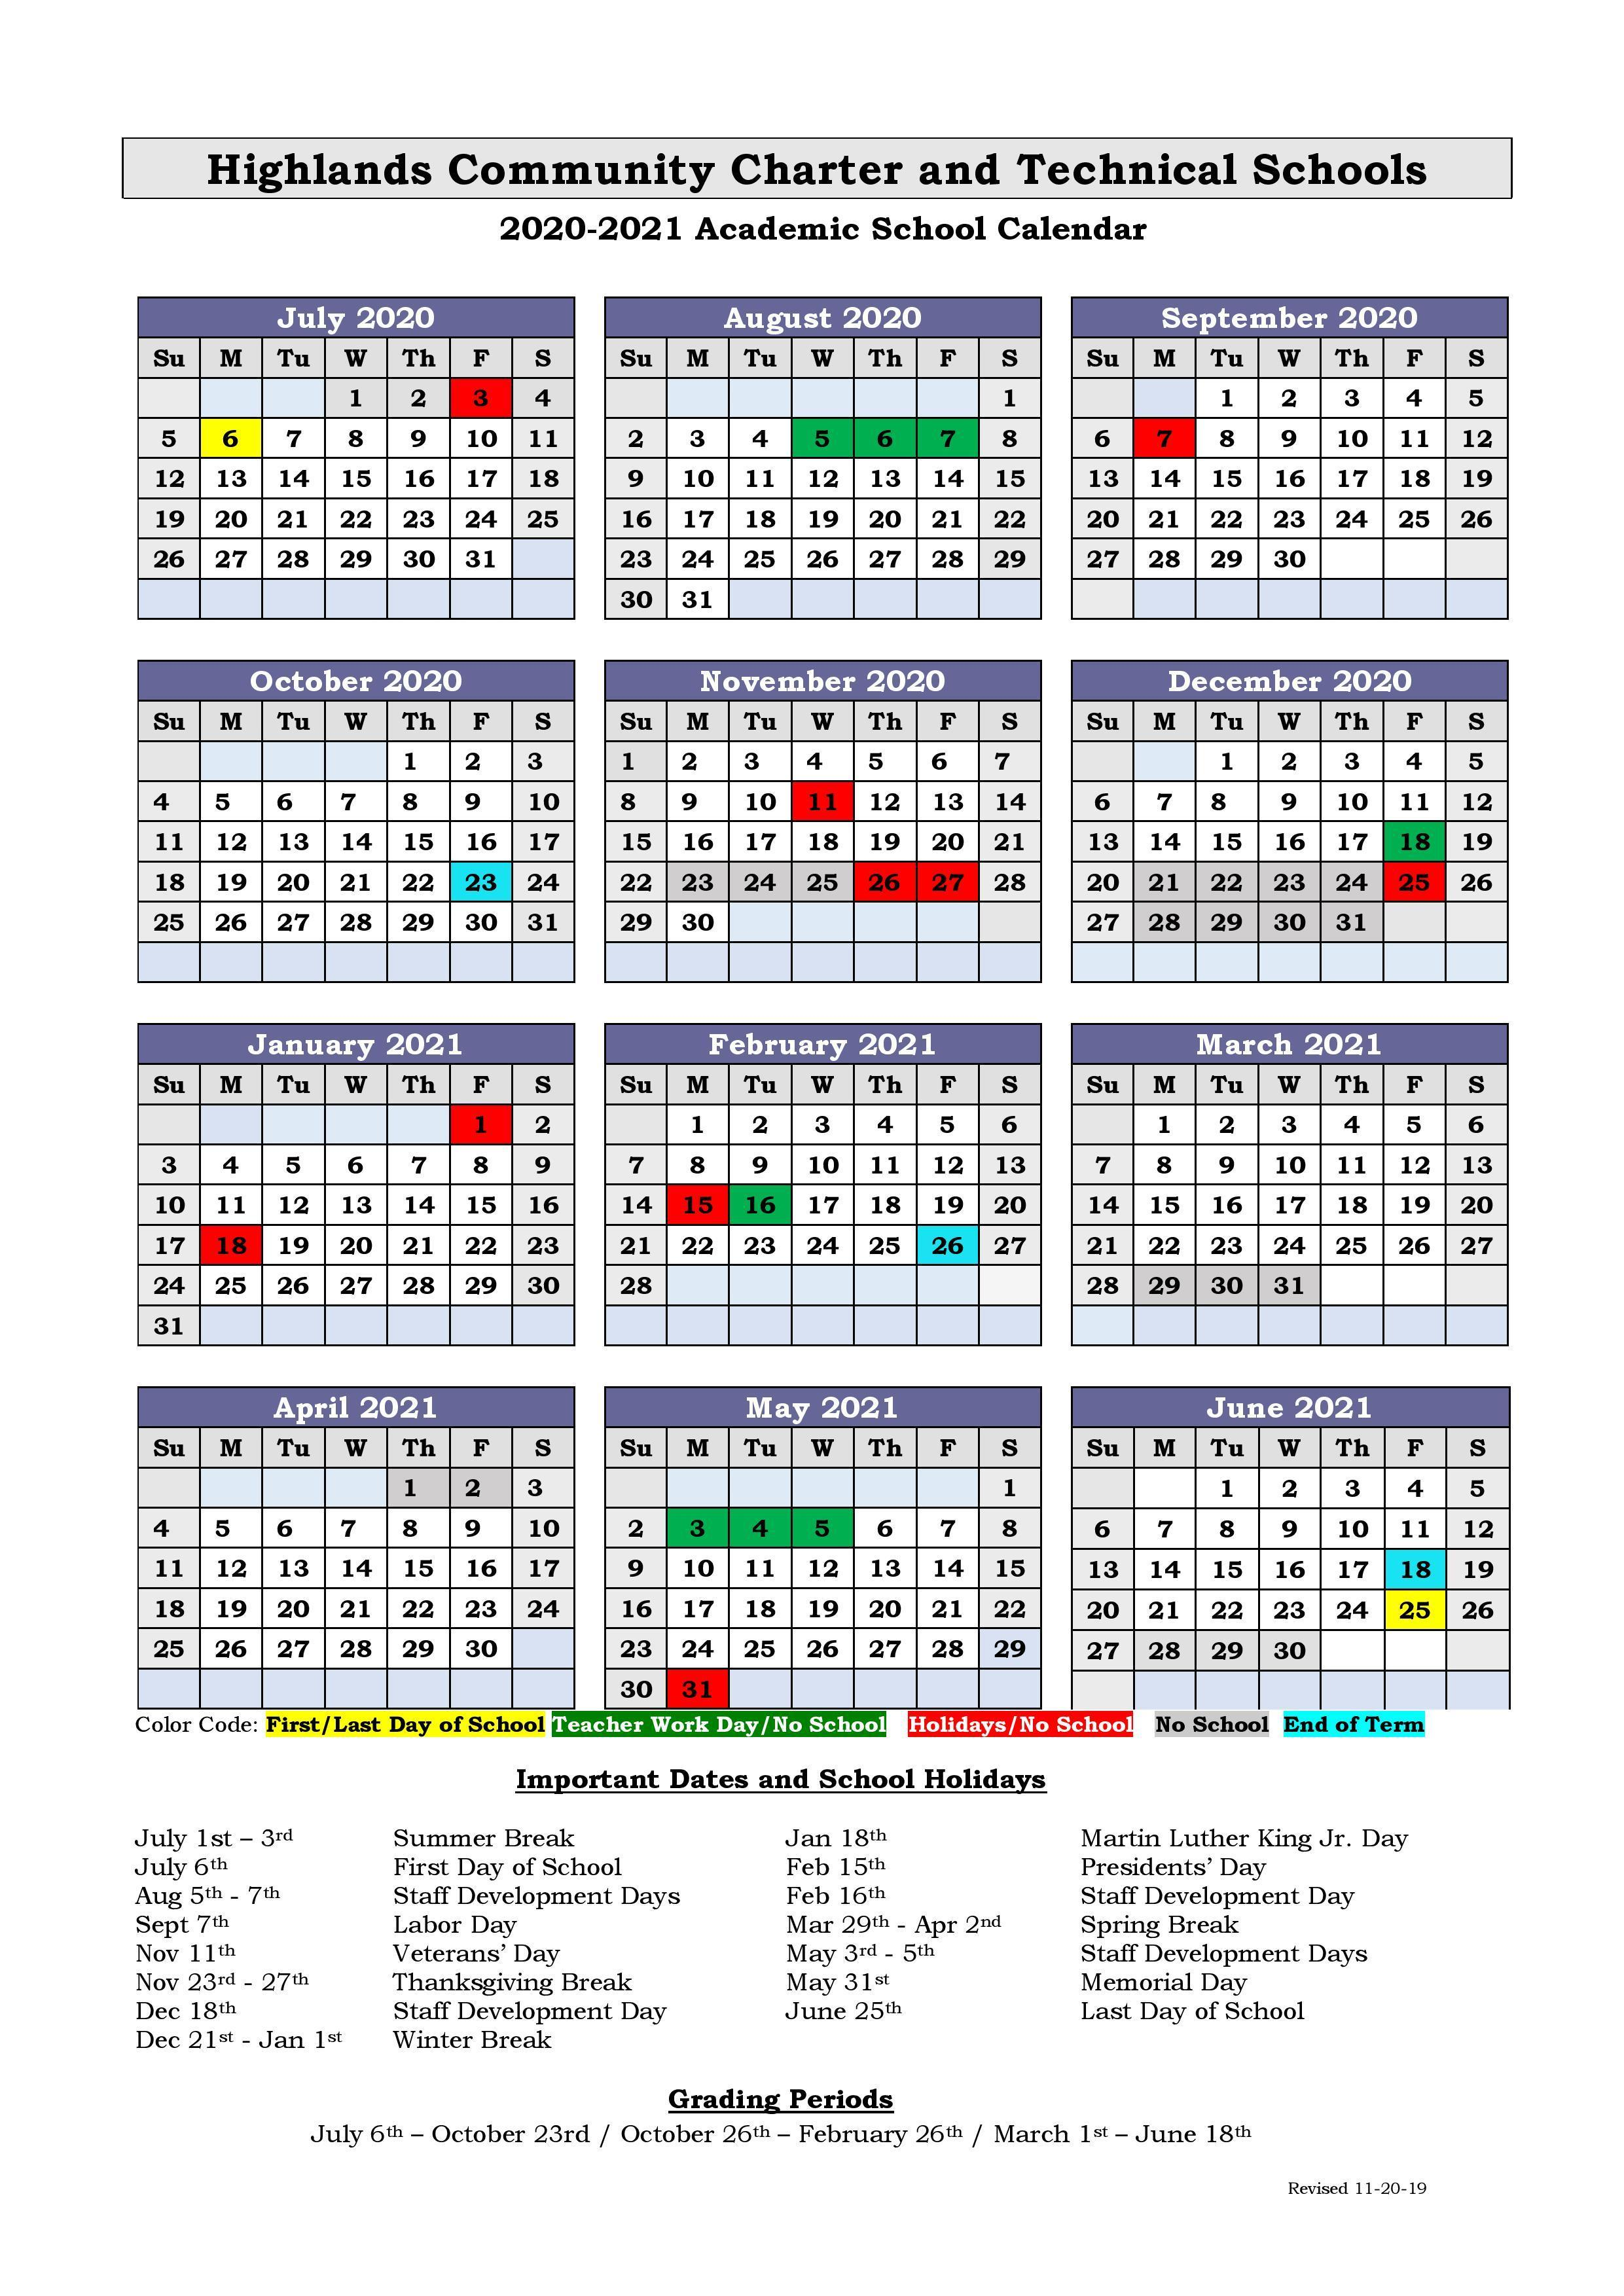 Calendar 20-21